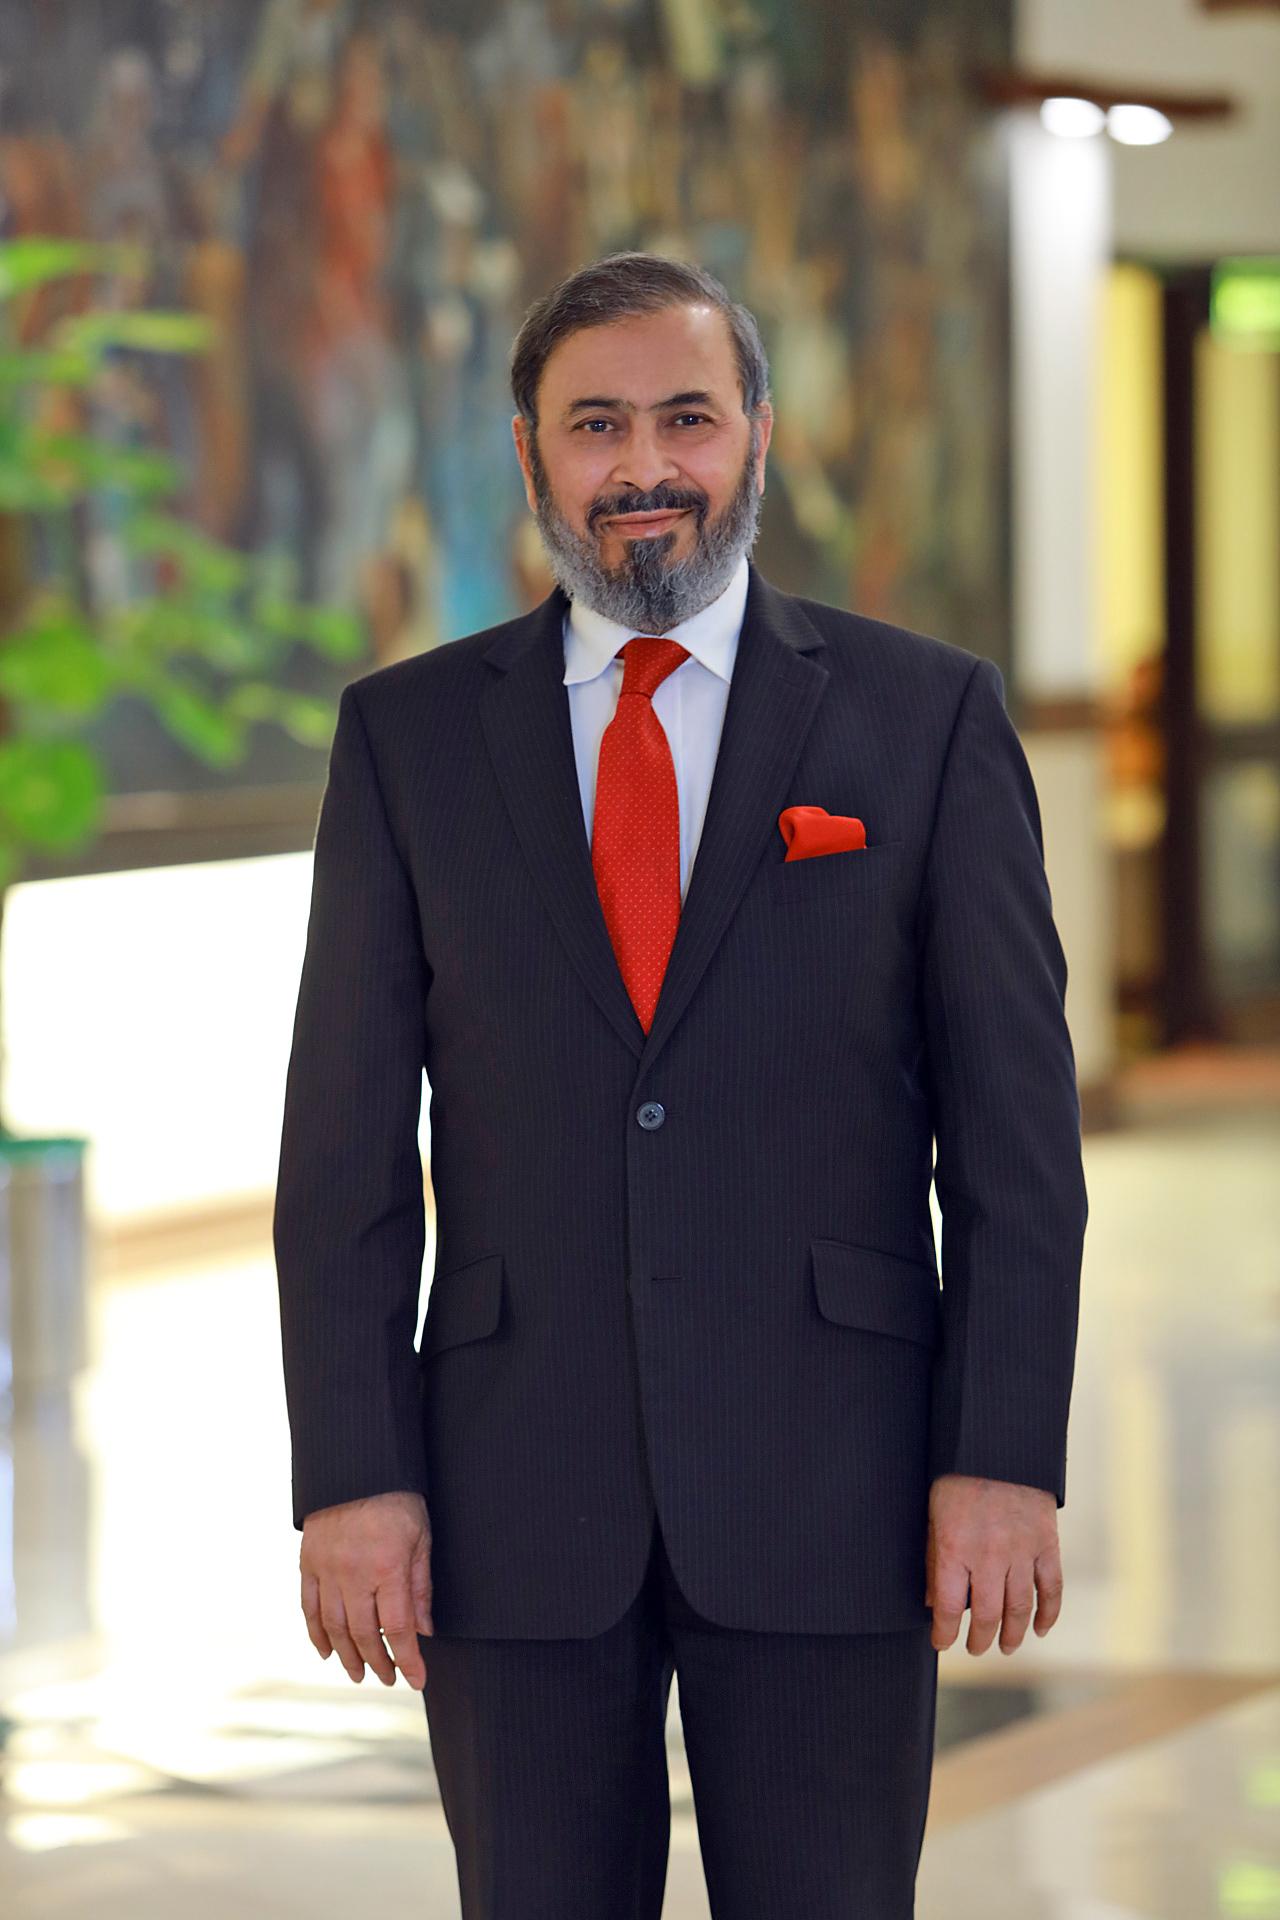 NBP President Saeed Ahmed. PHOTO: NBP OFFICIAL